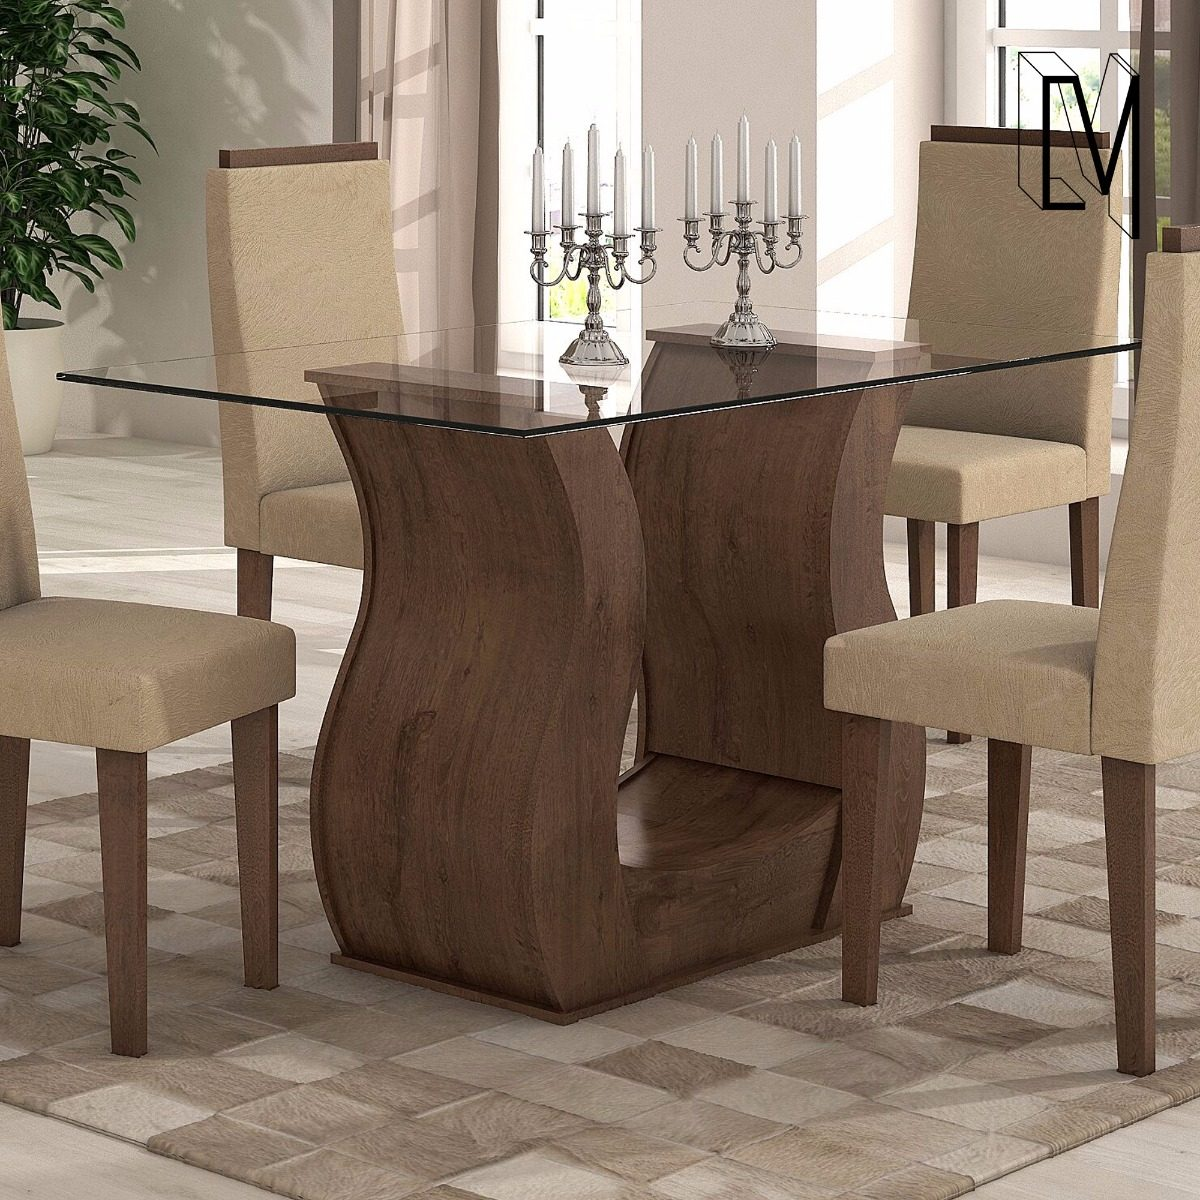 Mesa Comedor Living Madera Tapa De Vidrio Diseño Moderno ! - $ 5.010 ...